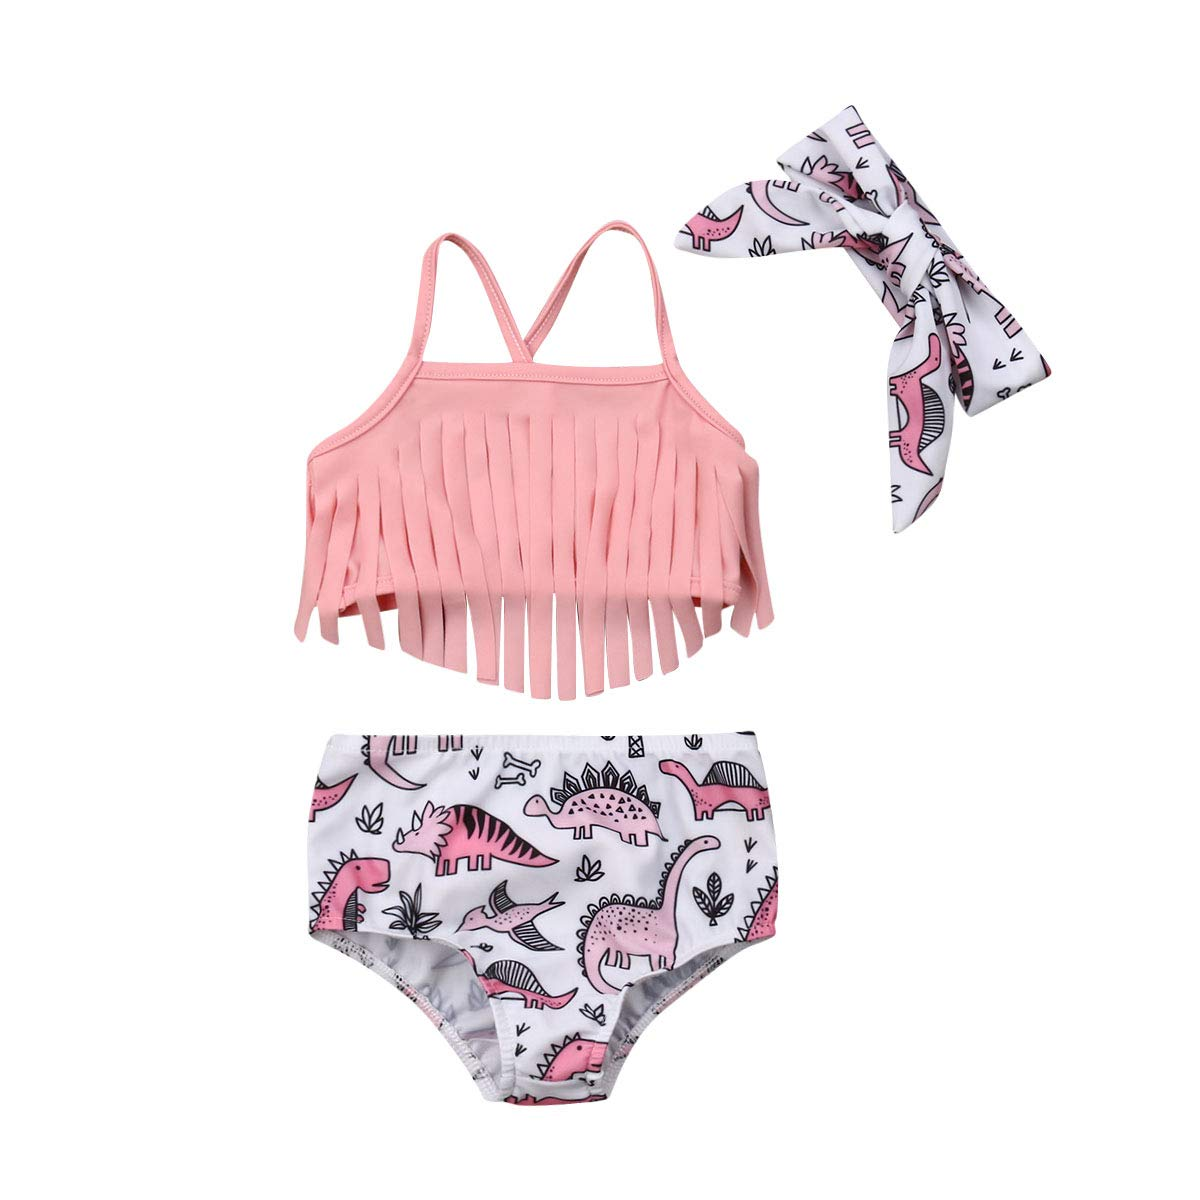 Floral Print Short Pants Bowknot Headband 3Pcs Bathing Suit Set Infant Baby Girl Bikini Tassel Shoulder Straps Swimsuit